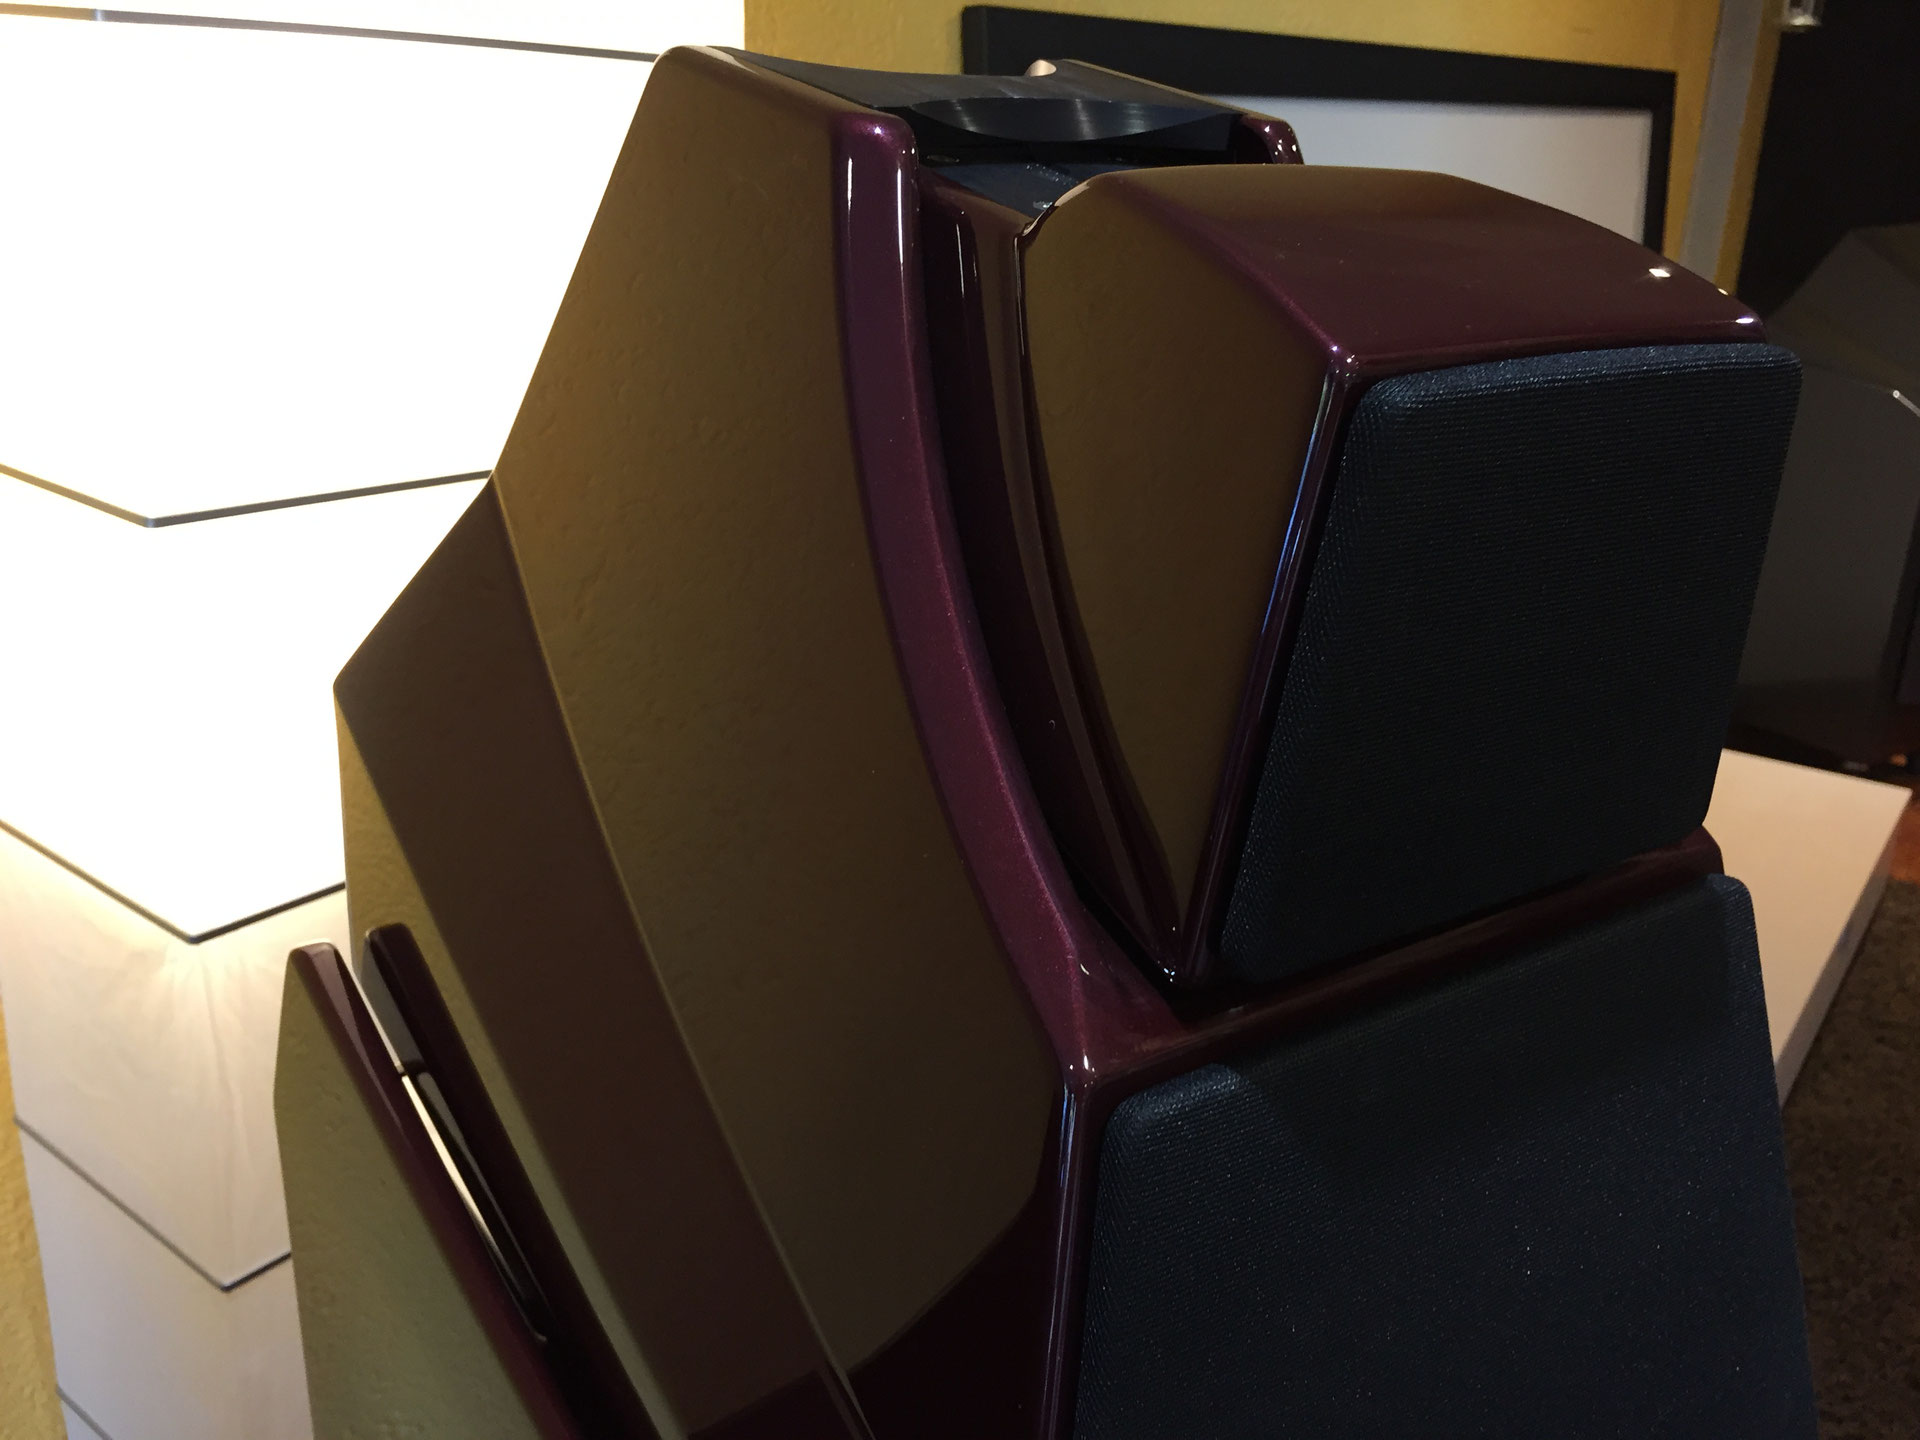 wilson event 2017 audio video spalinger dietlikon nad nad hifi revox rowen wilson audio. Black Bedroom Furniture Sets. Home Design Ideas